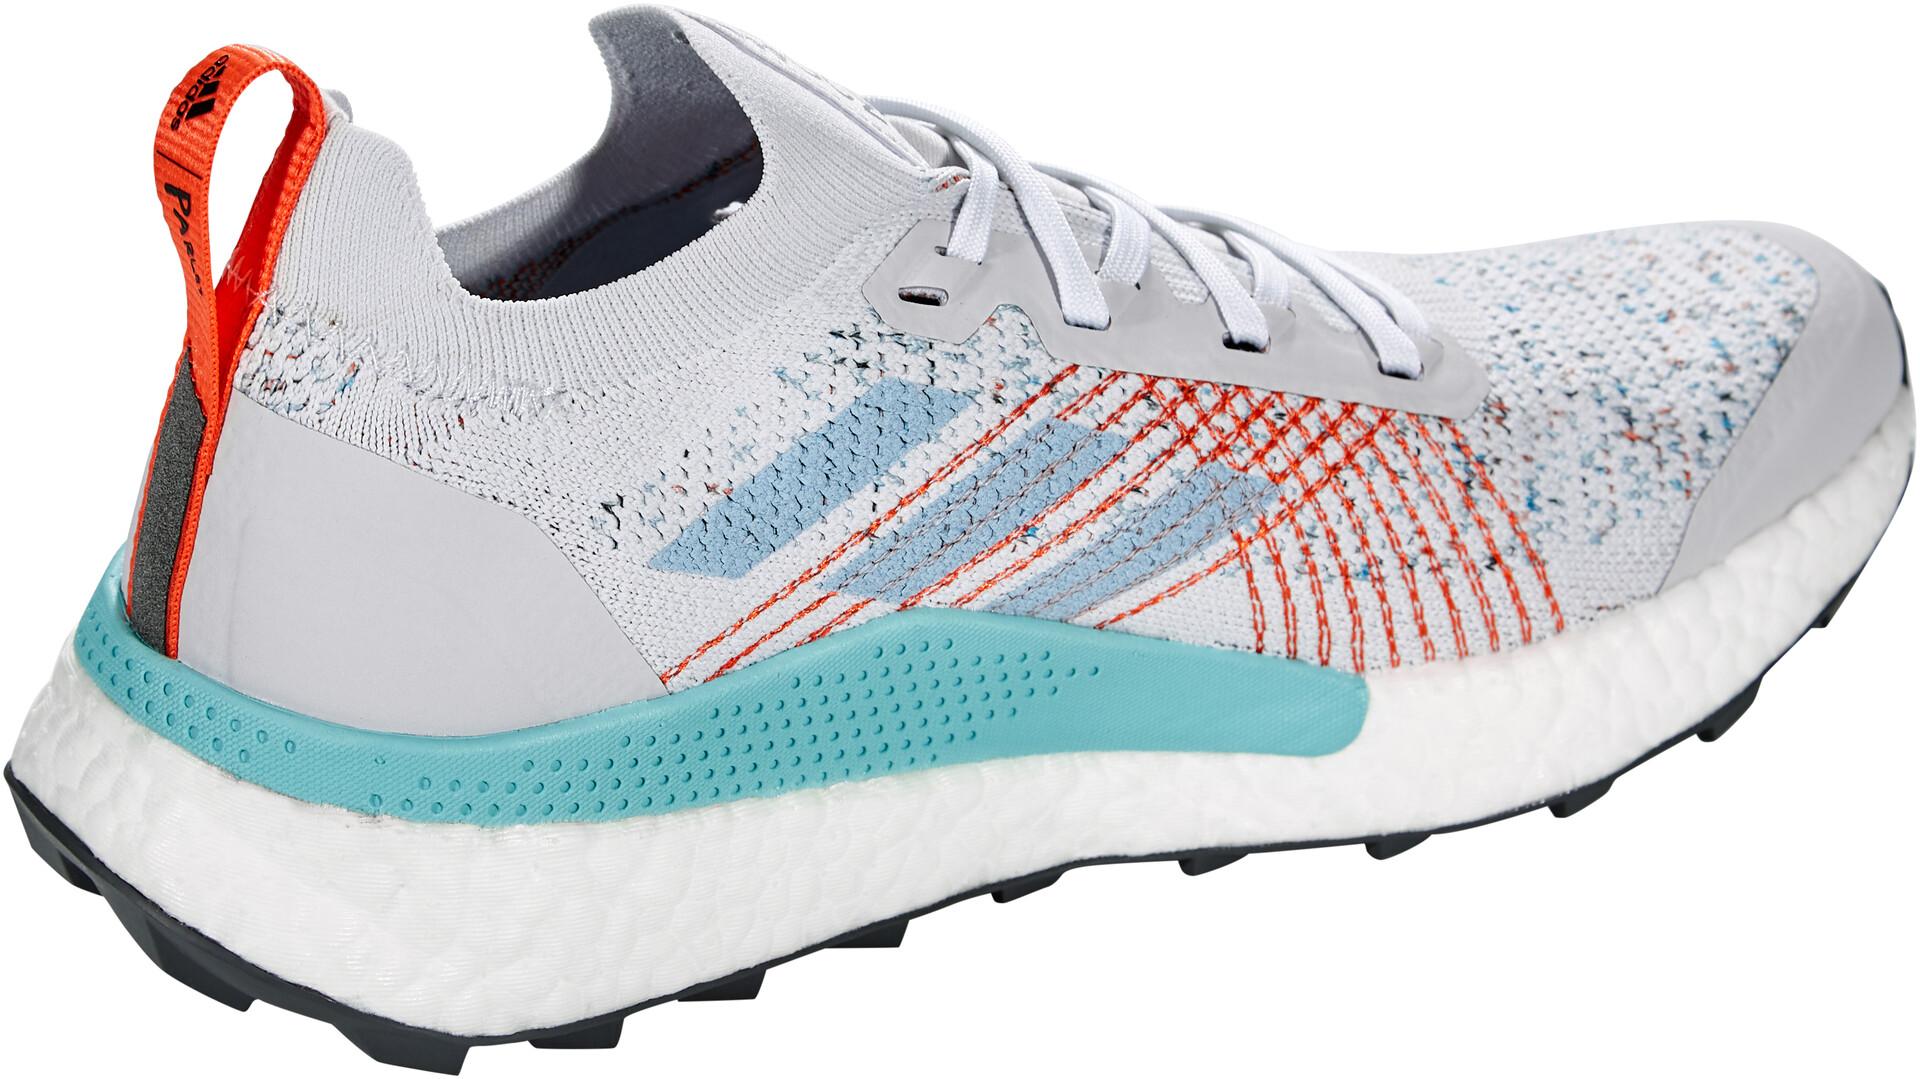 adidas TERREX Two Ultra Parley Scarpe da trail running Uomo, dash grey/footwear white/true orange su Addnature 1rw5m